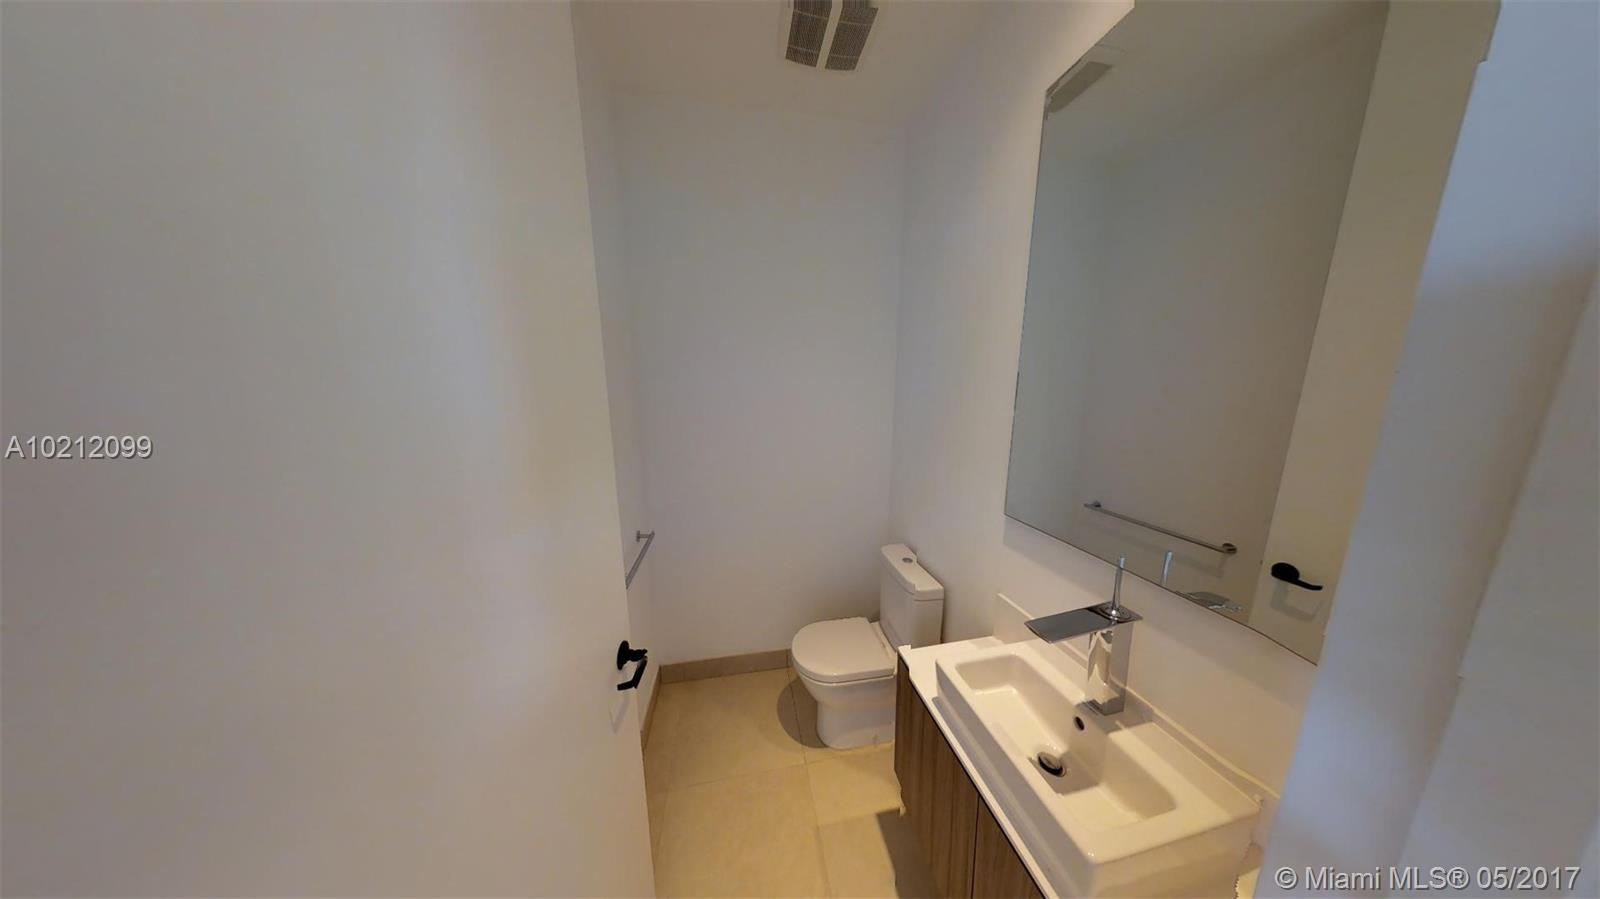 Pflegestufe 1 Badezimmer